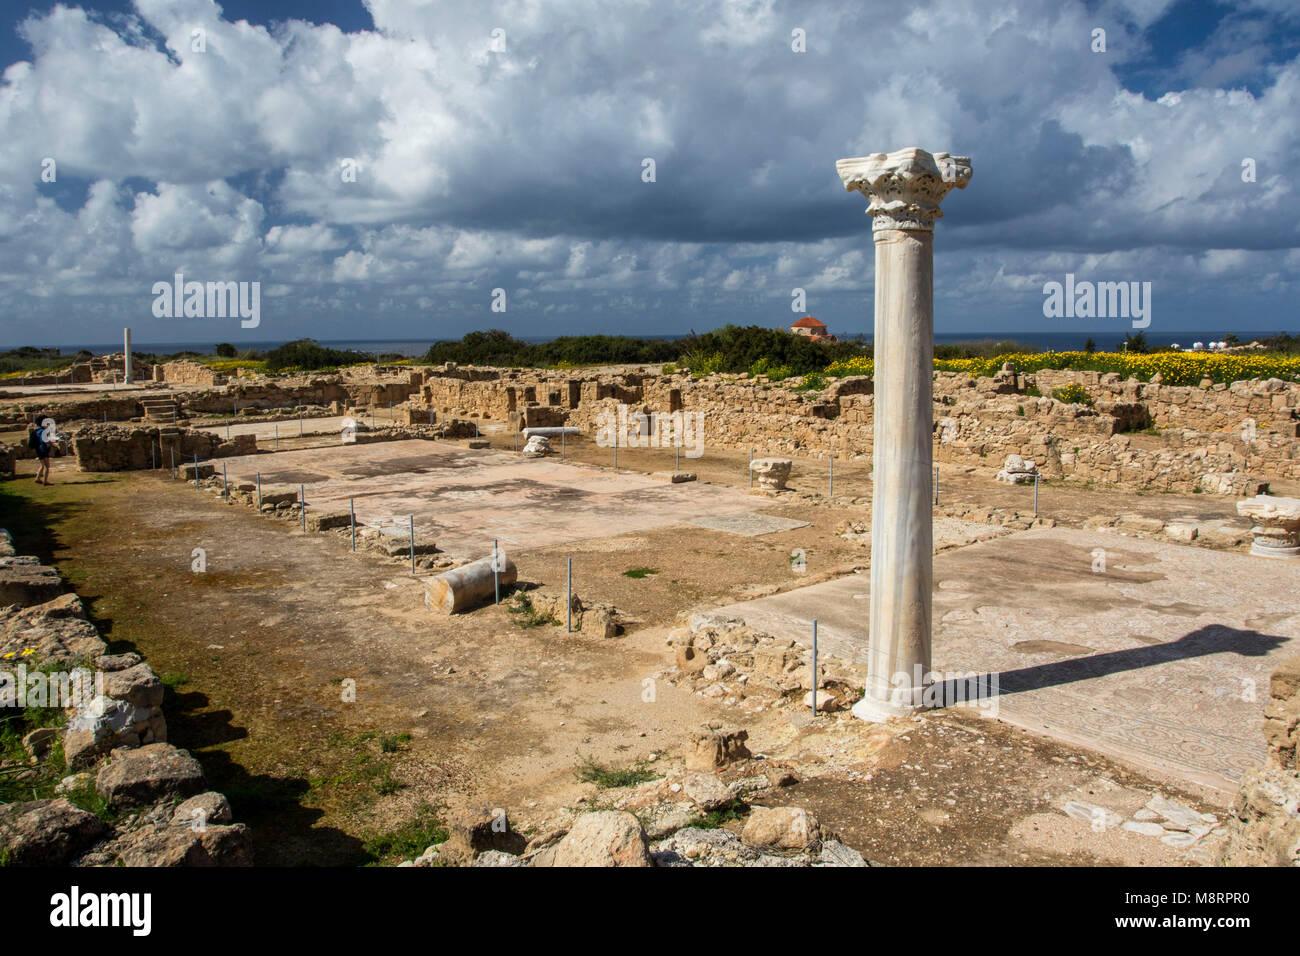 Archeoligical site at Agios Georgious, Paphos district, Cyprus, Mediterranean Stock Photo